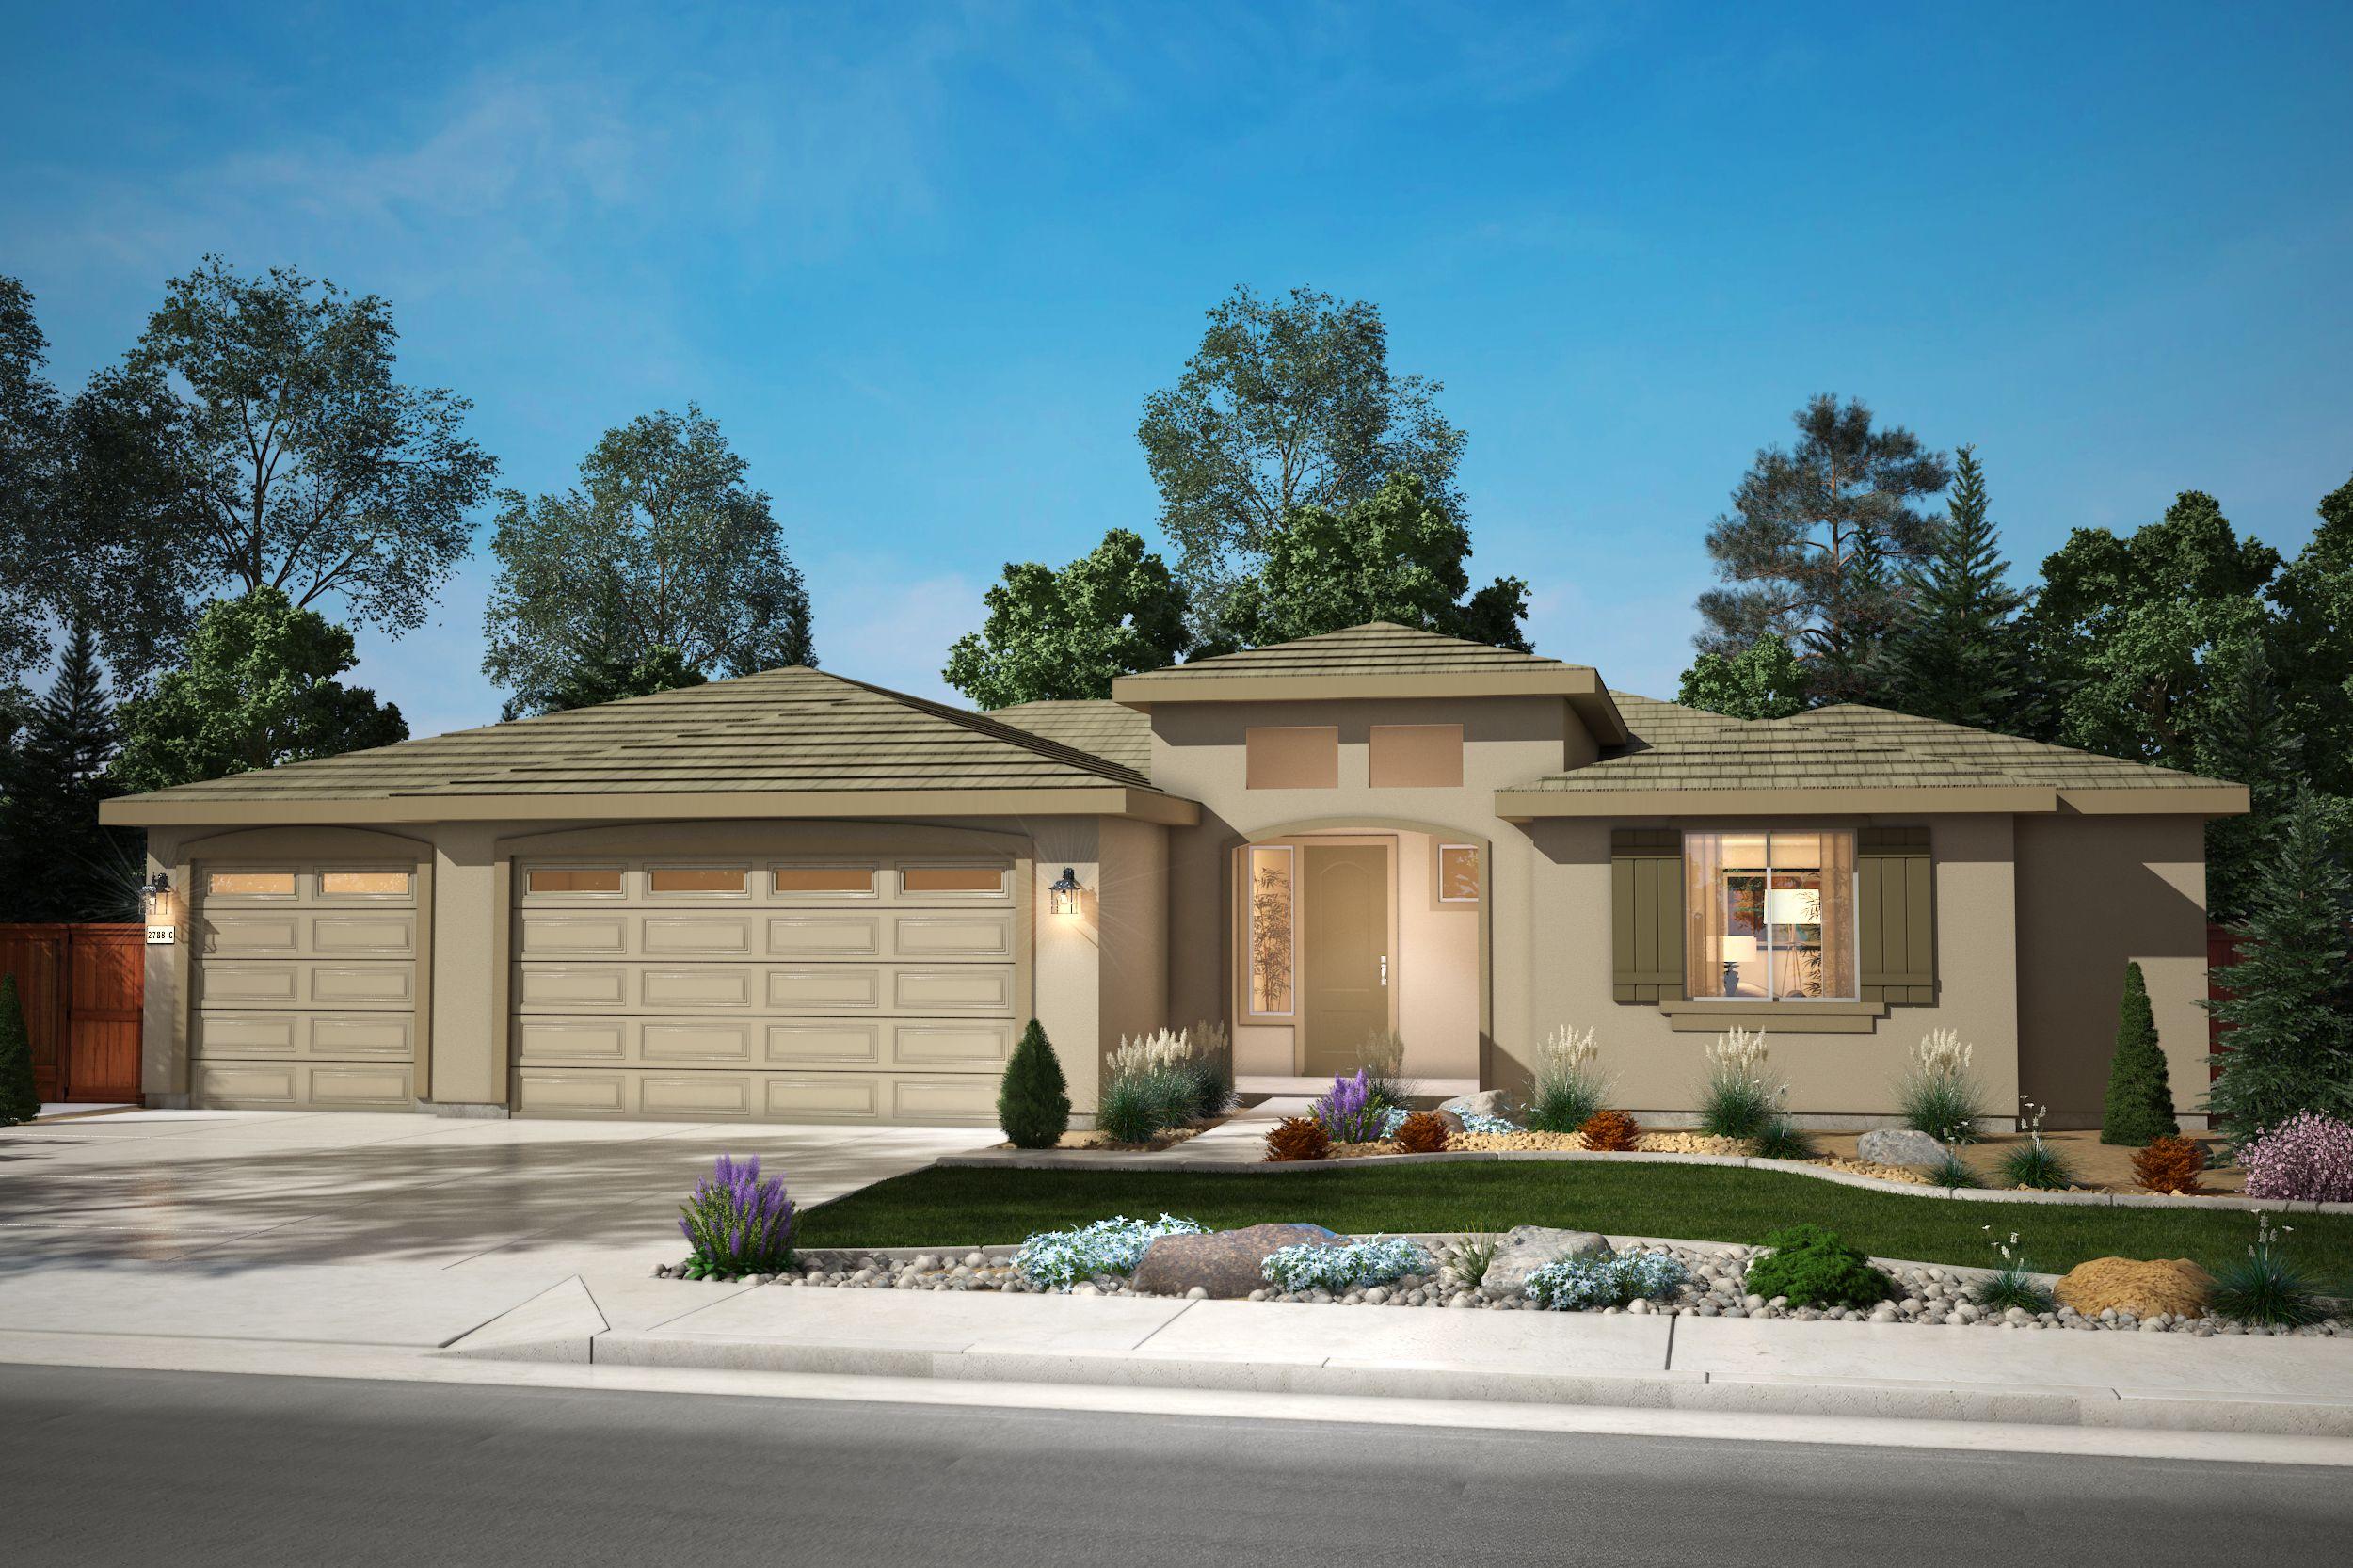 'Eagle Canyon Estates' by Silverado Homes - Sparks in Reno